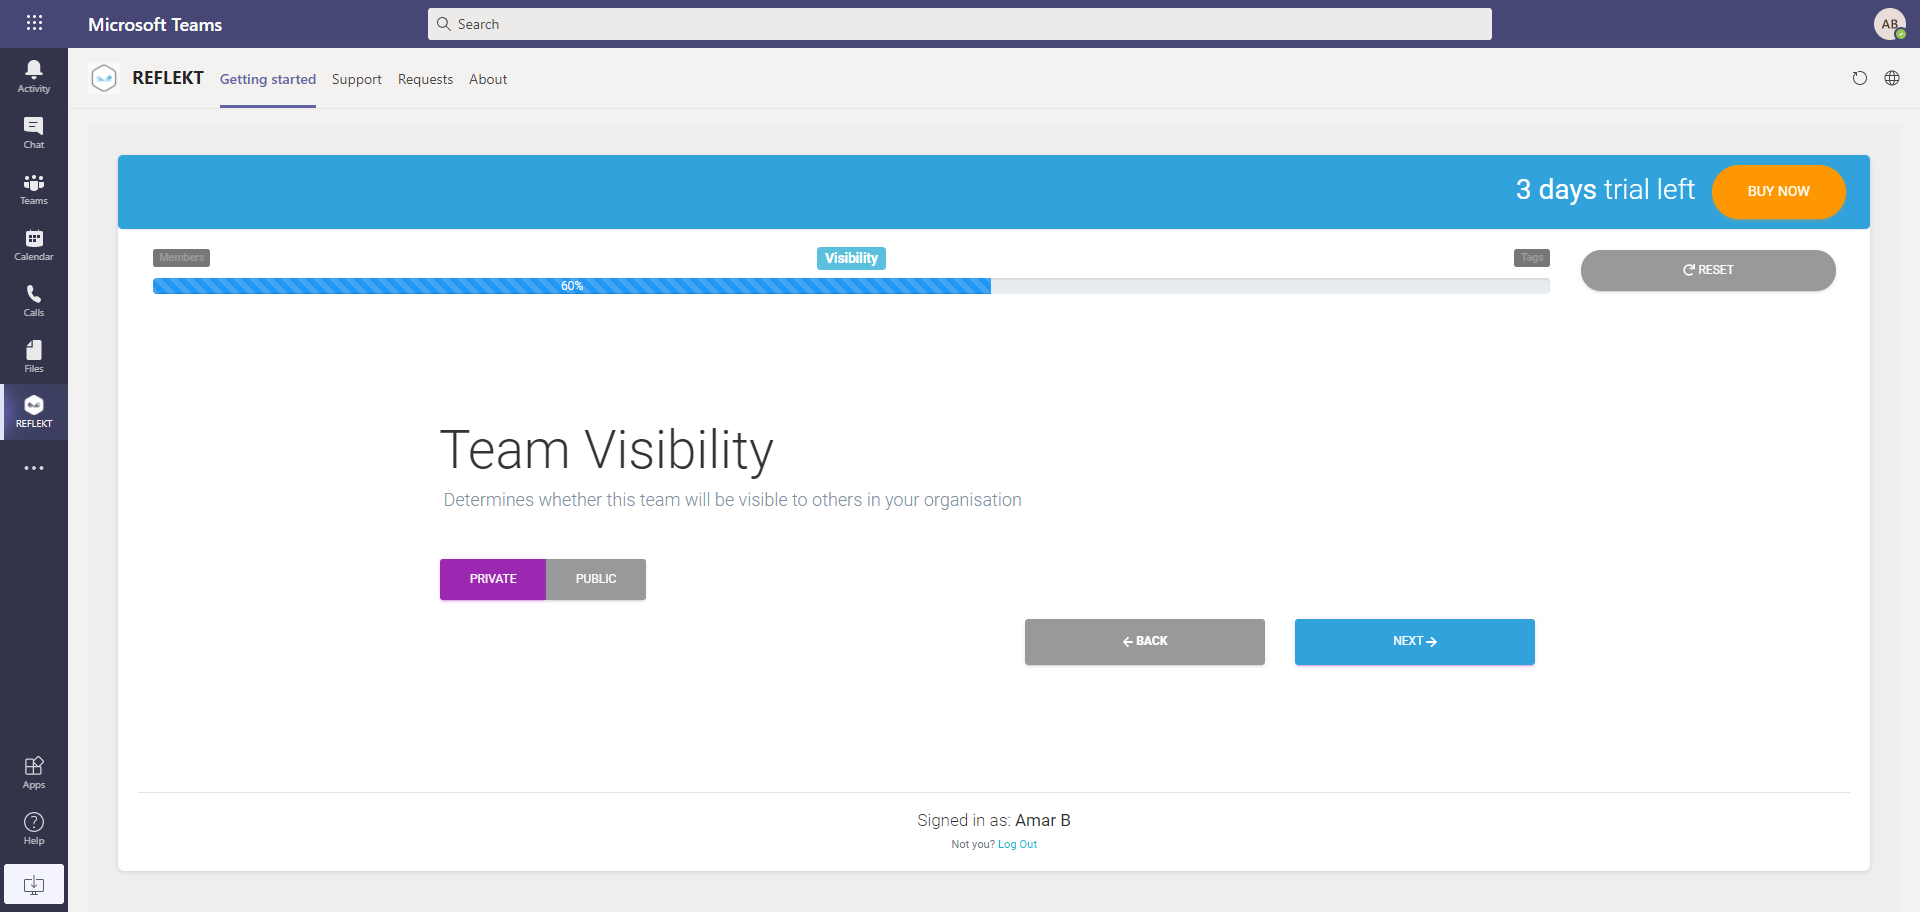 Team Visibility